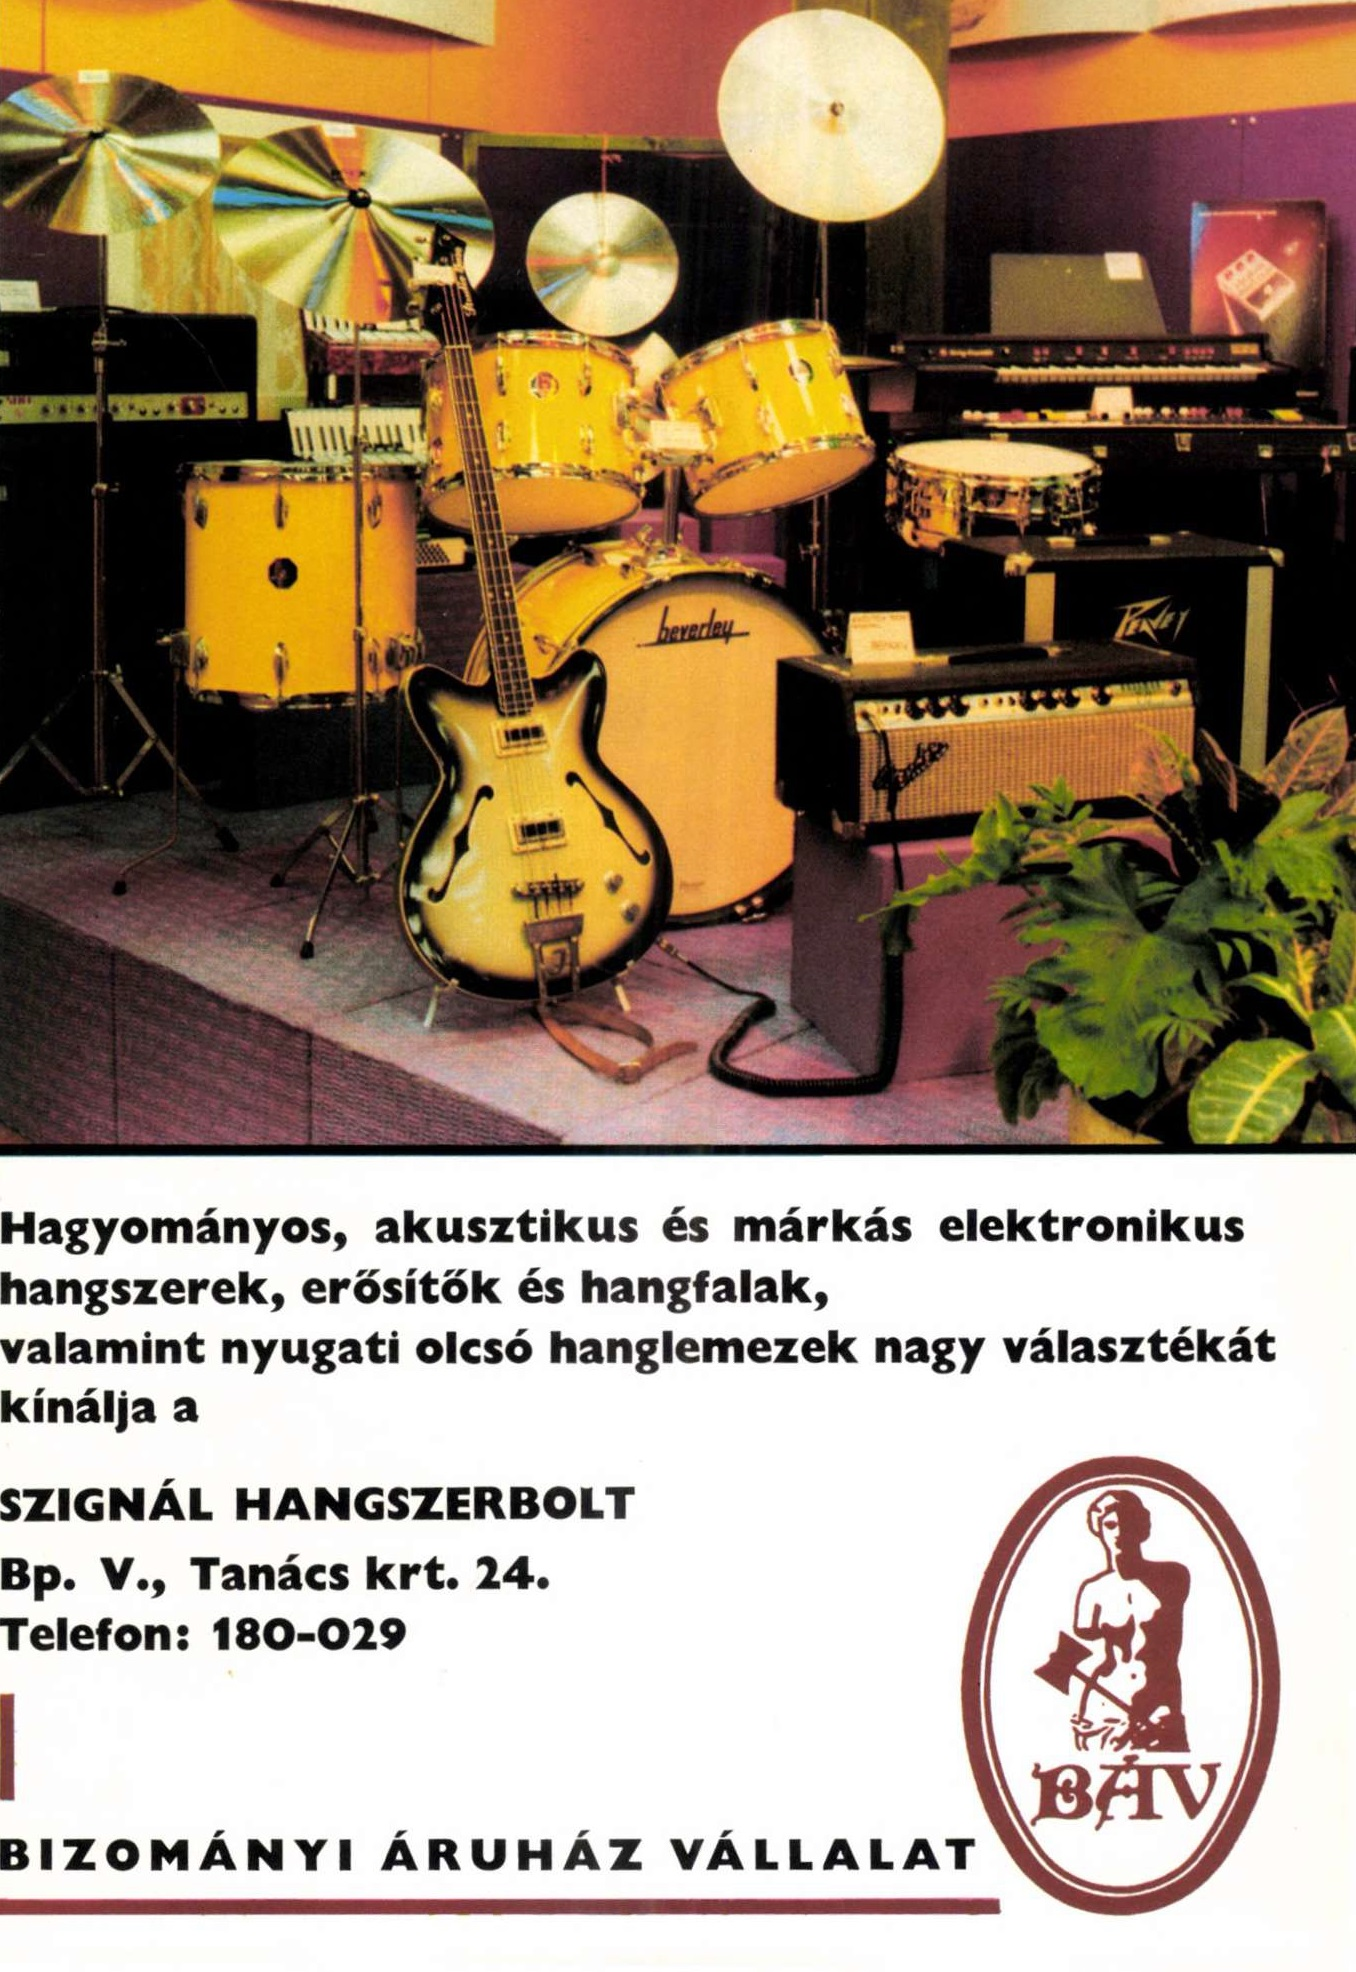 idokapszula_nb_i_1983_84_magyarorszag_spanyolorszag_reklam_1.jpg